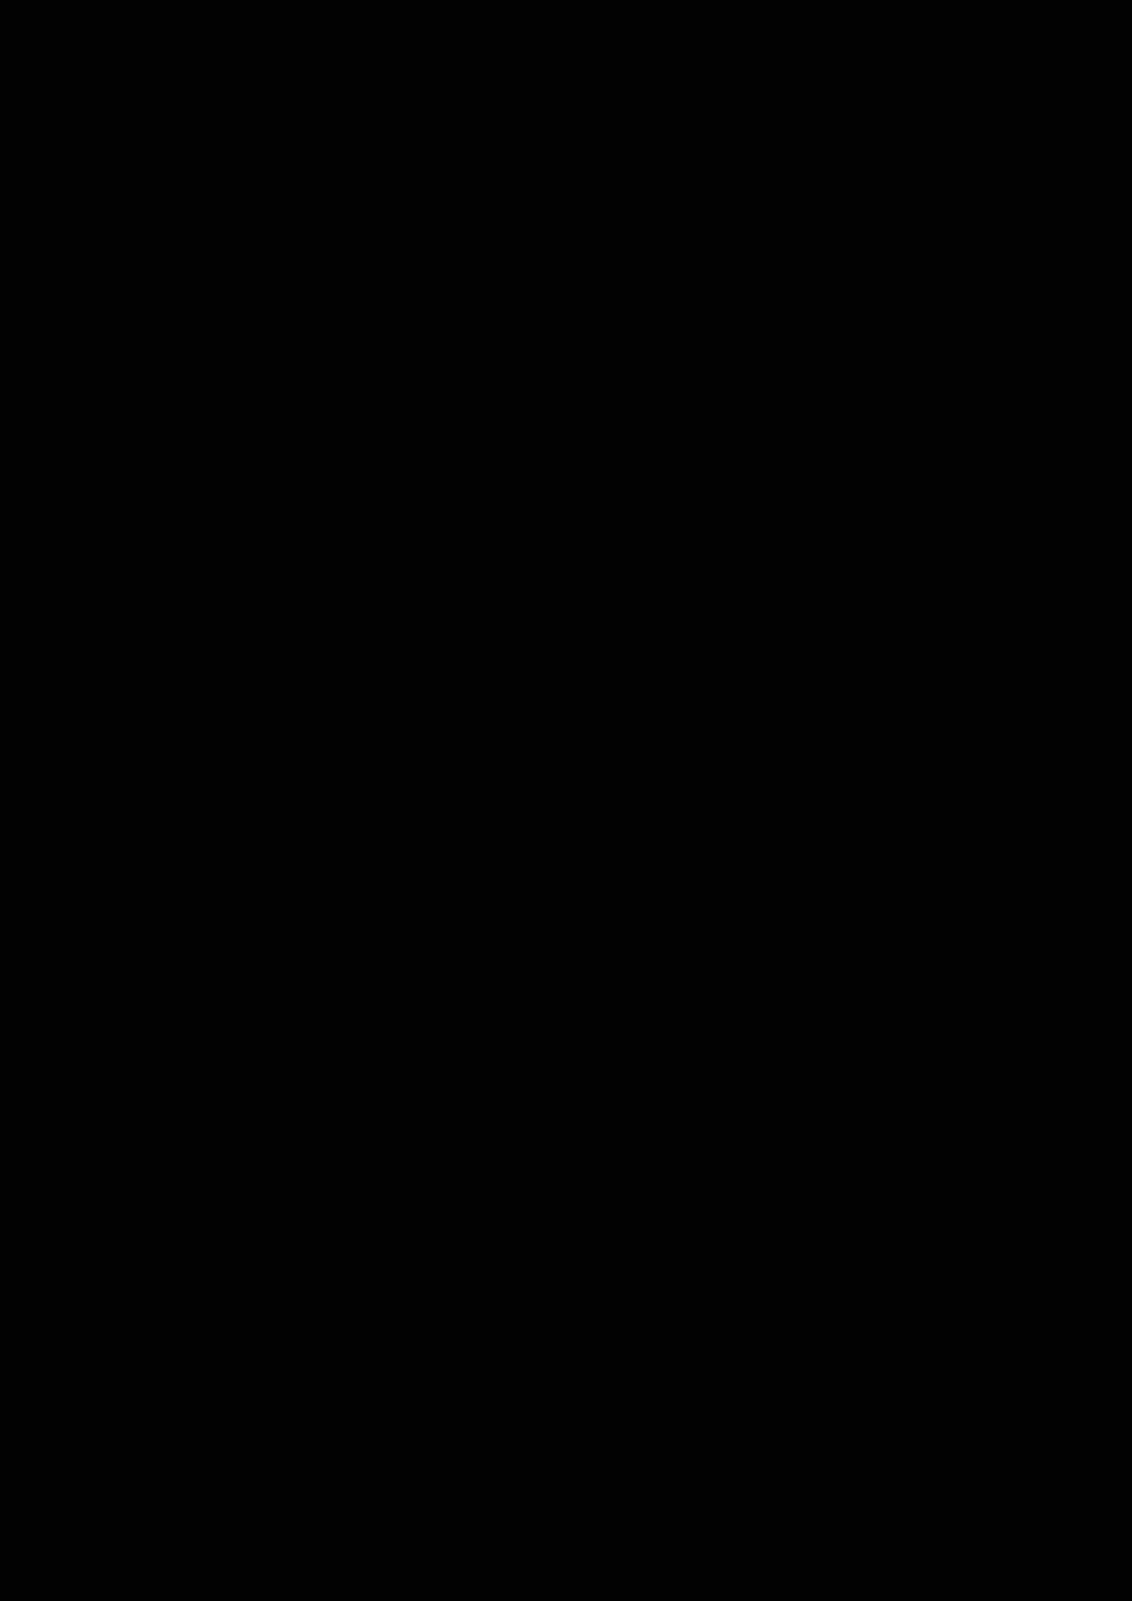 CHujina slide, Image 7